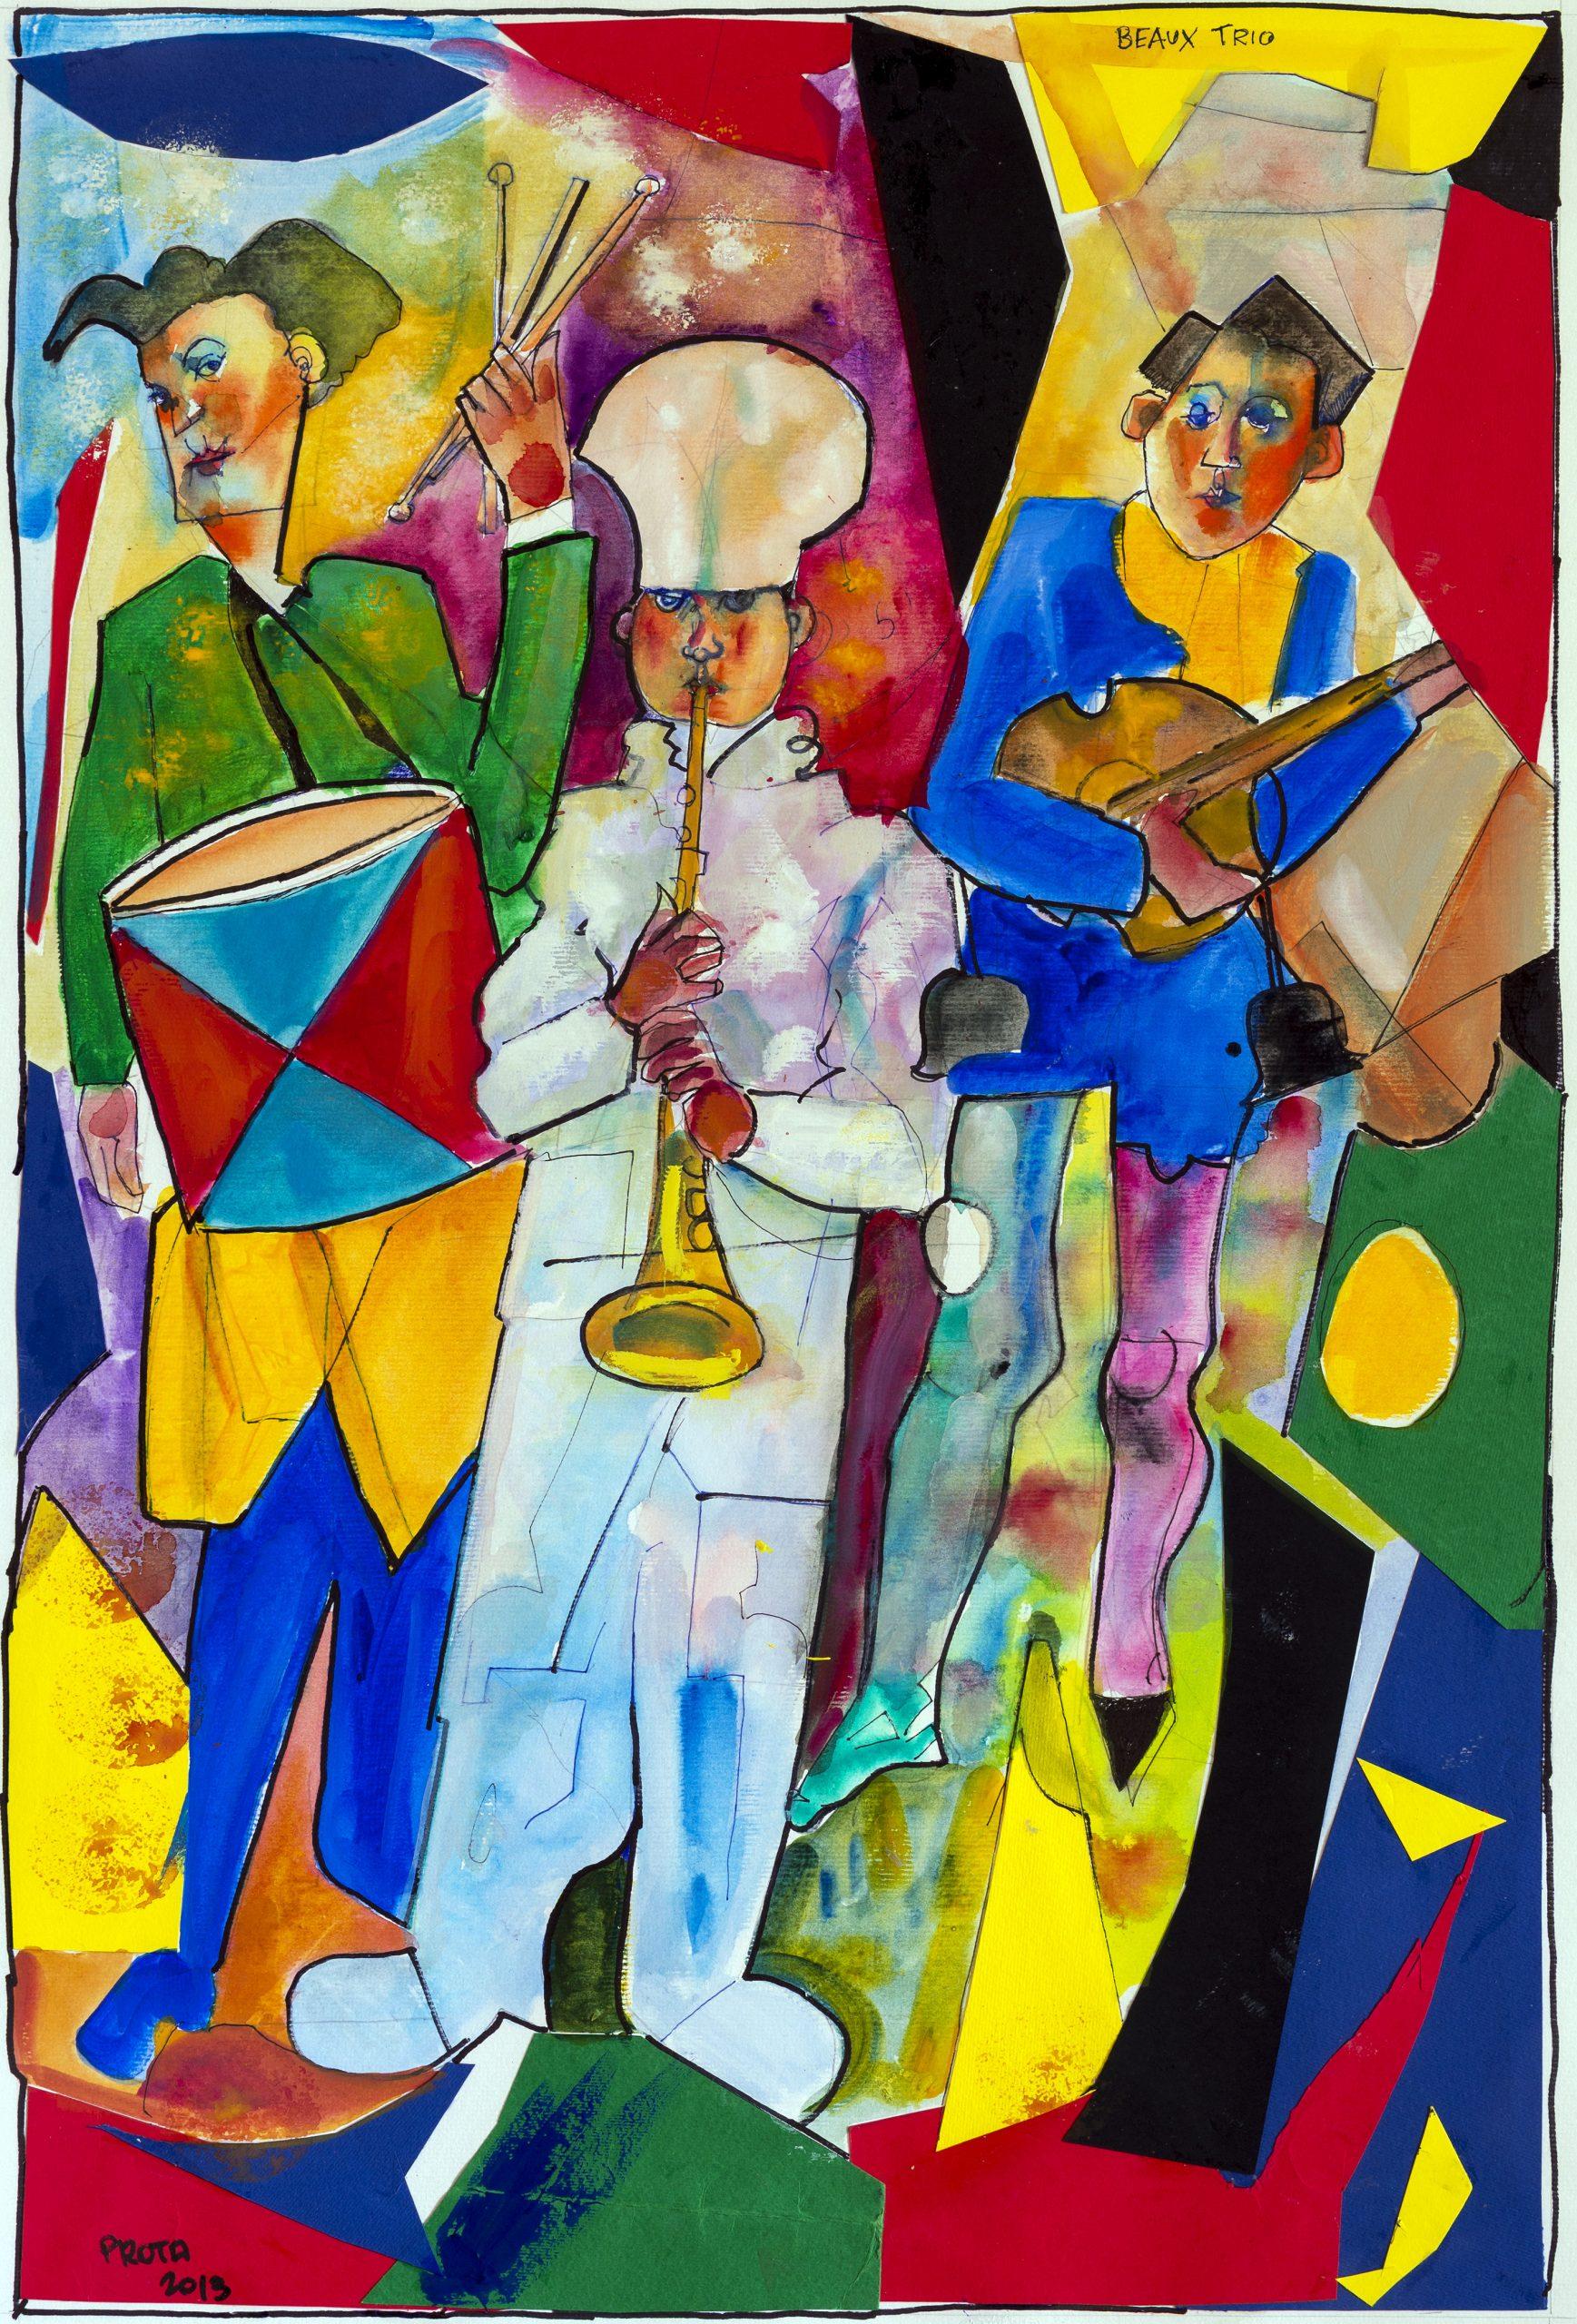 2013 - Beaux-Trio 2013 - 56x38 cm